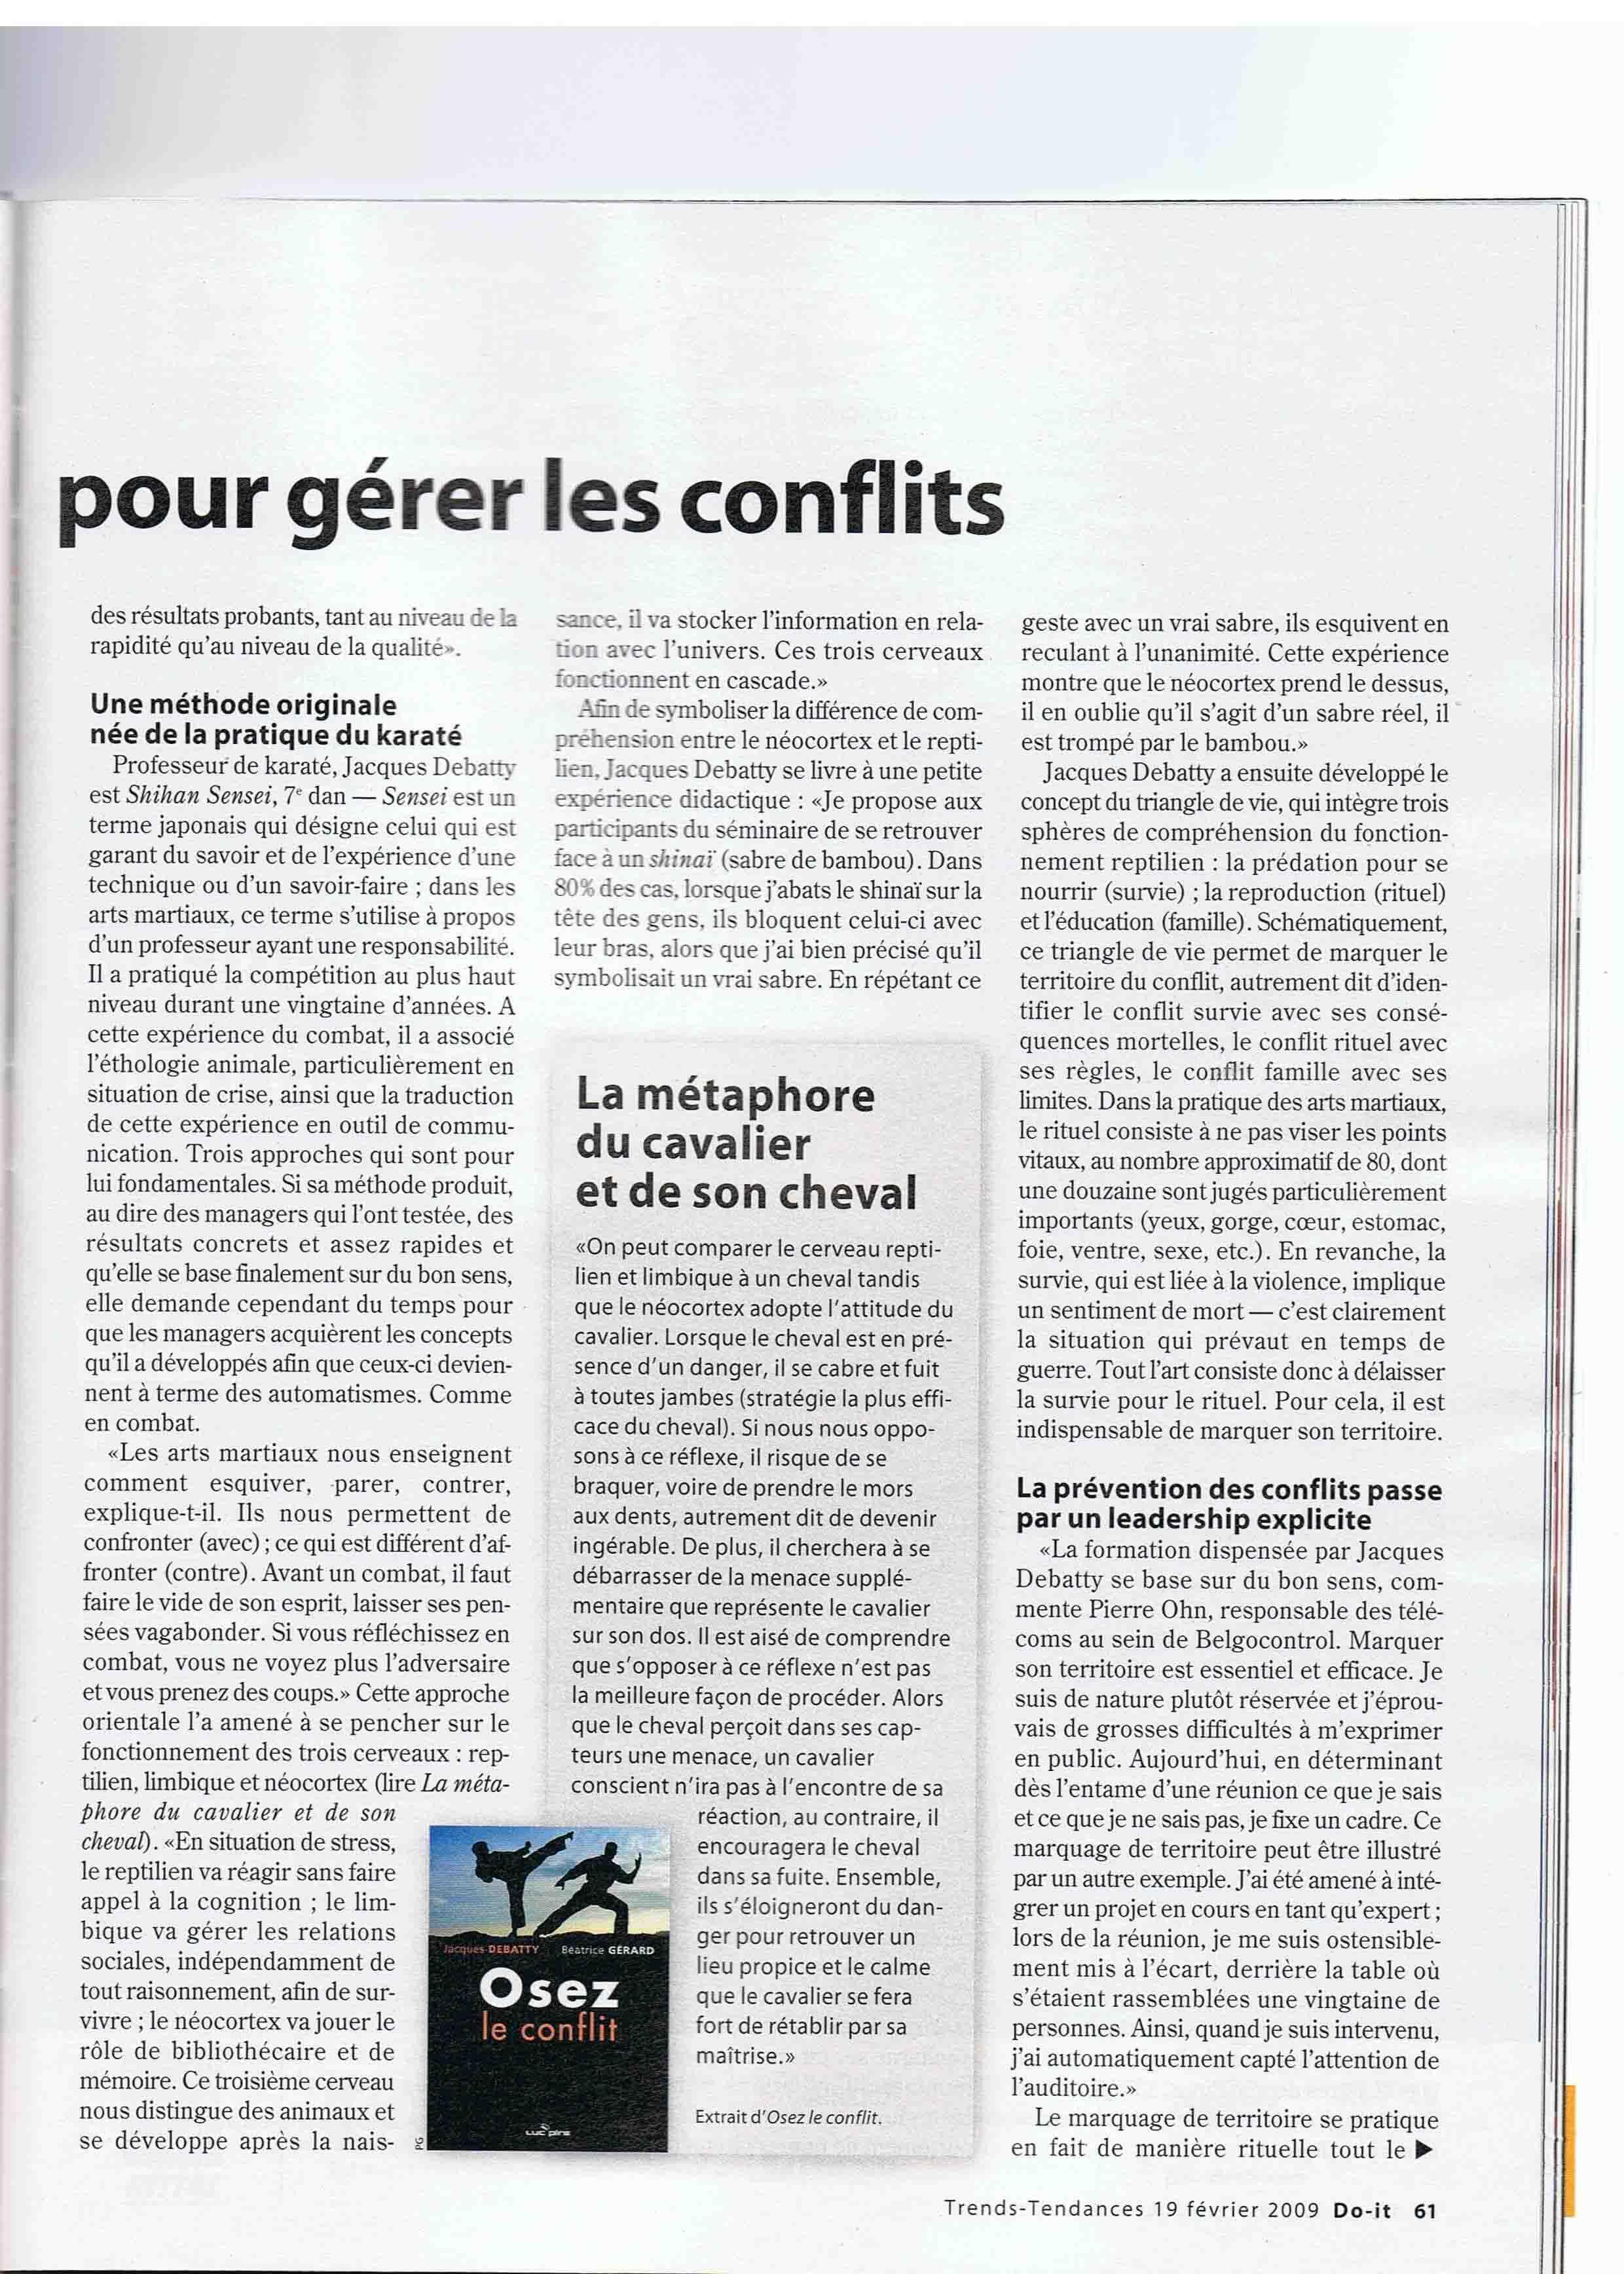 Article Trend Oser le conflit Shihan Sensei JKY Debatty